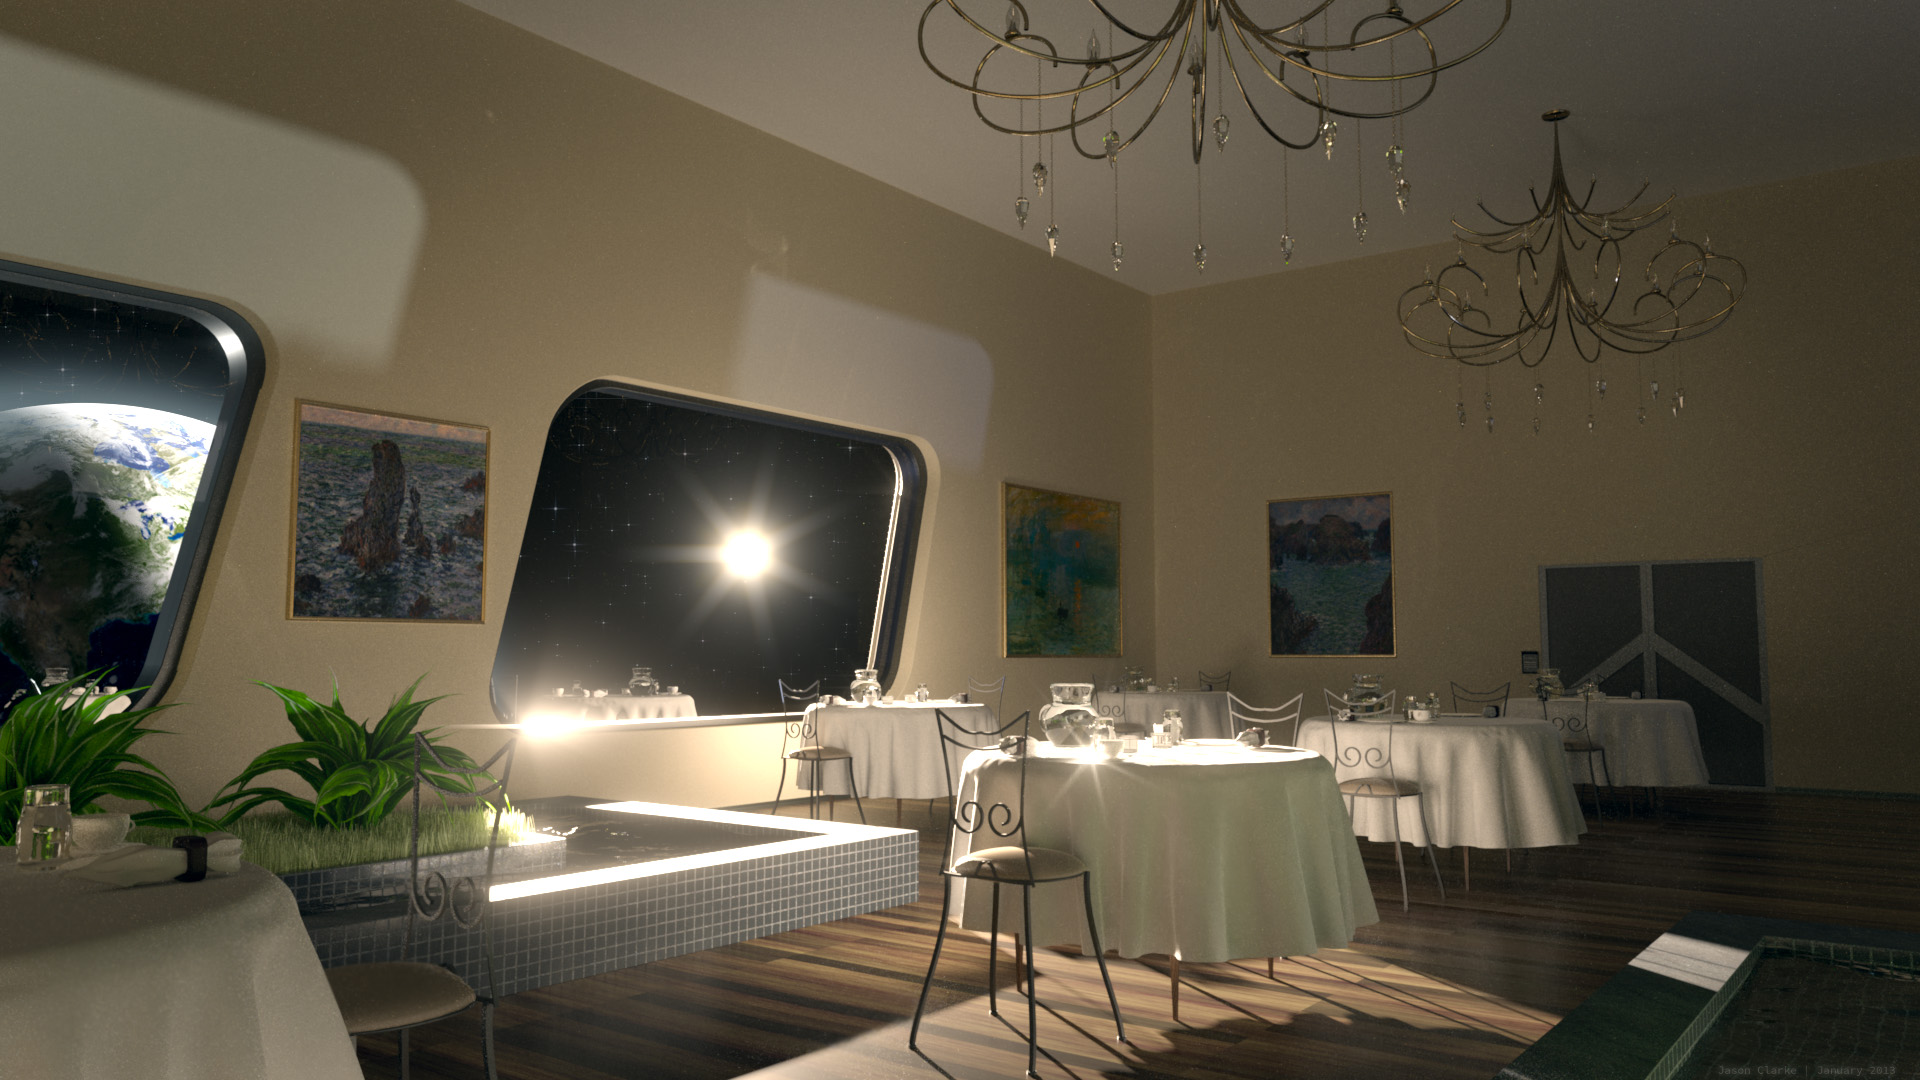 Orbital Restaurant by J-the-Ninja